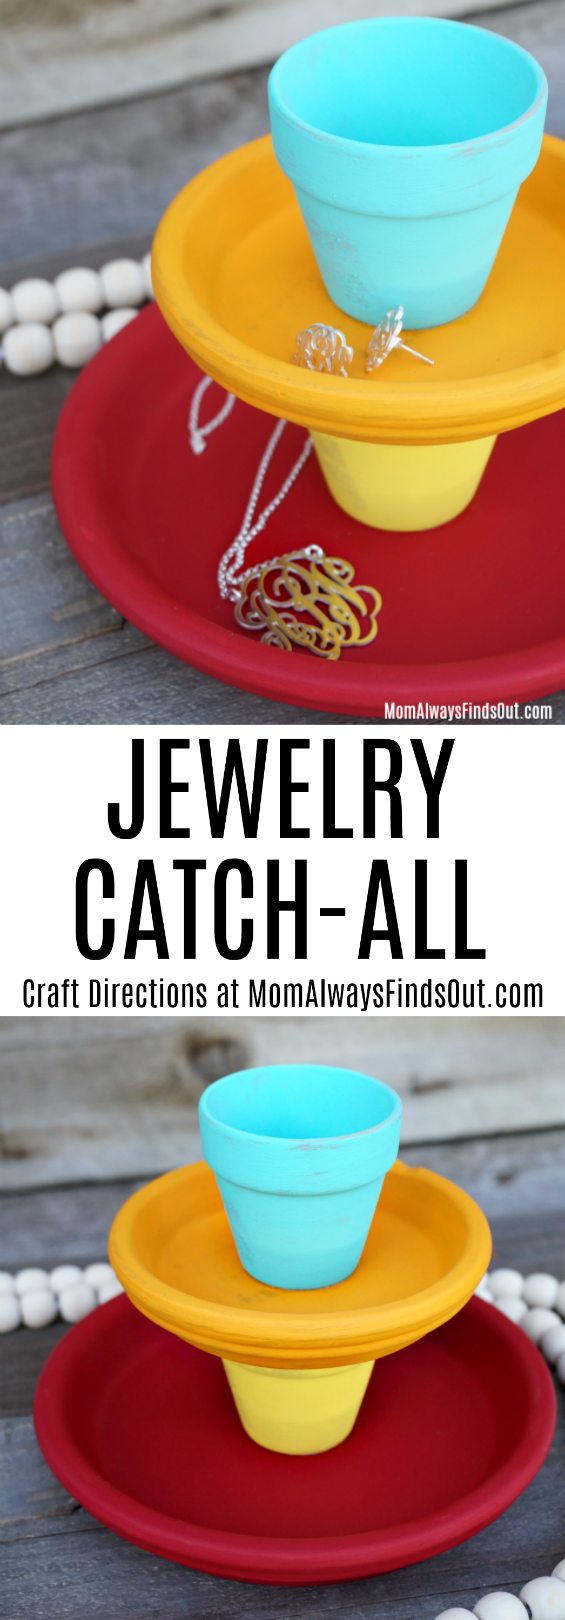 DIY Jewelry Catchall Craft Tutorial - Jewelry Holder Ideas - TerraCotta Pots Crafts